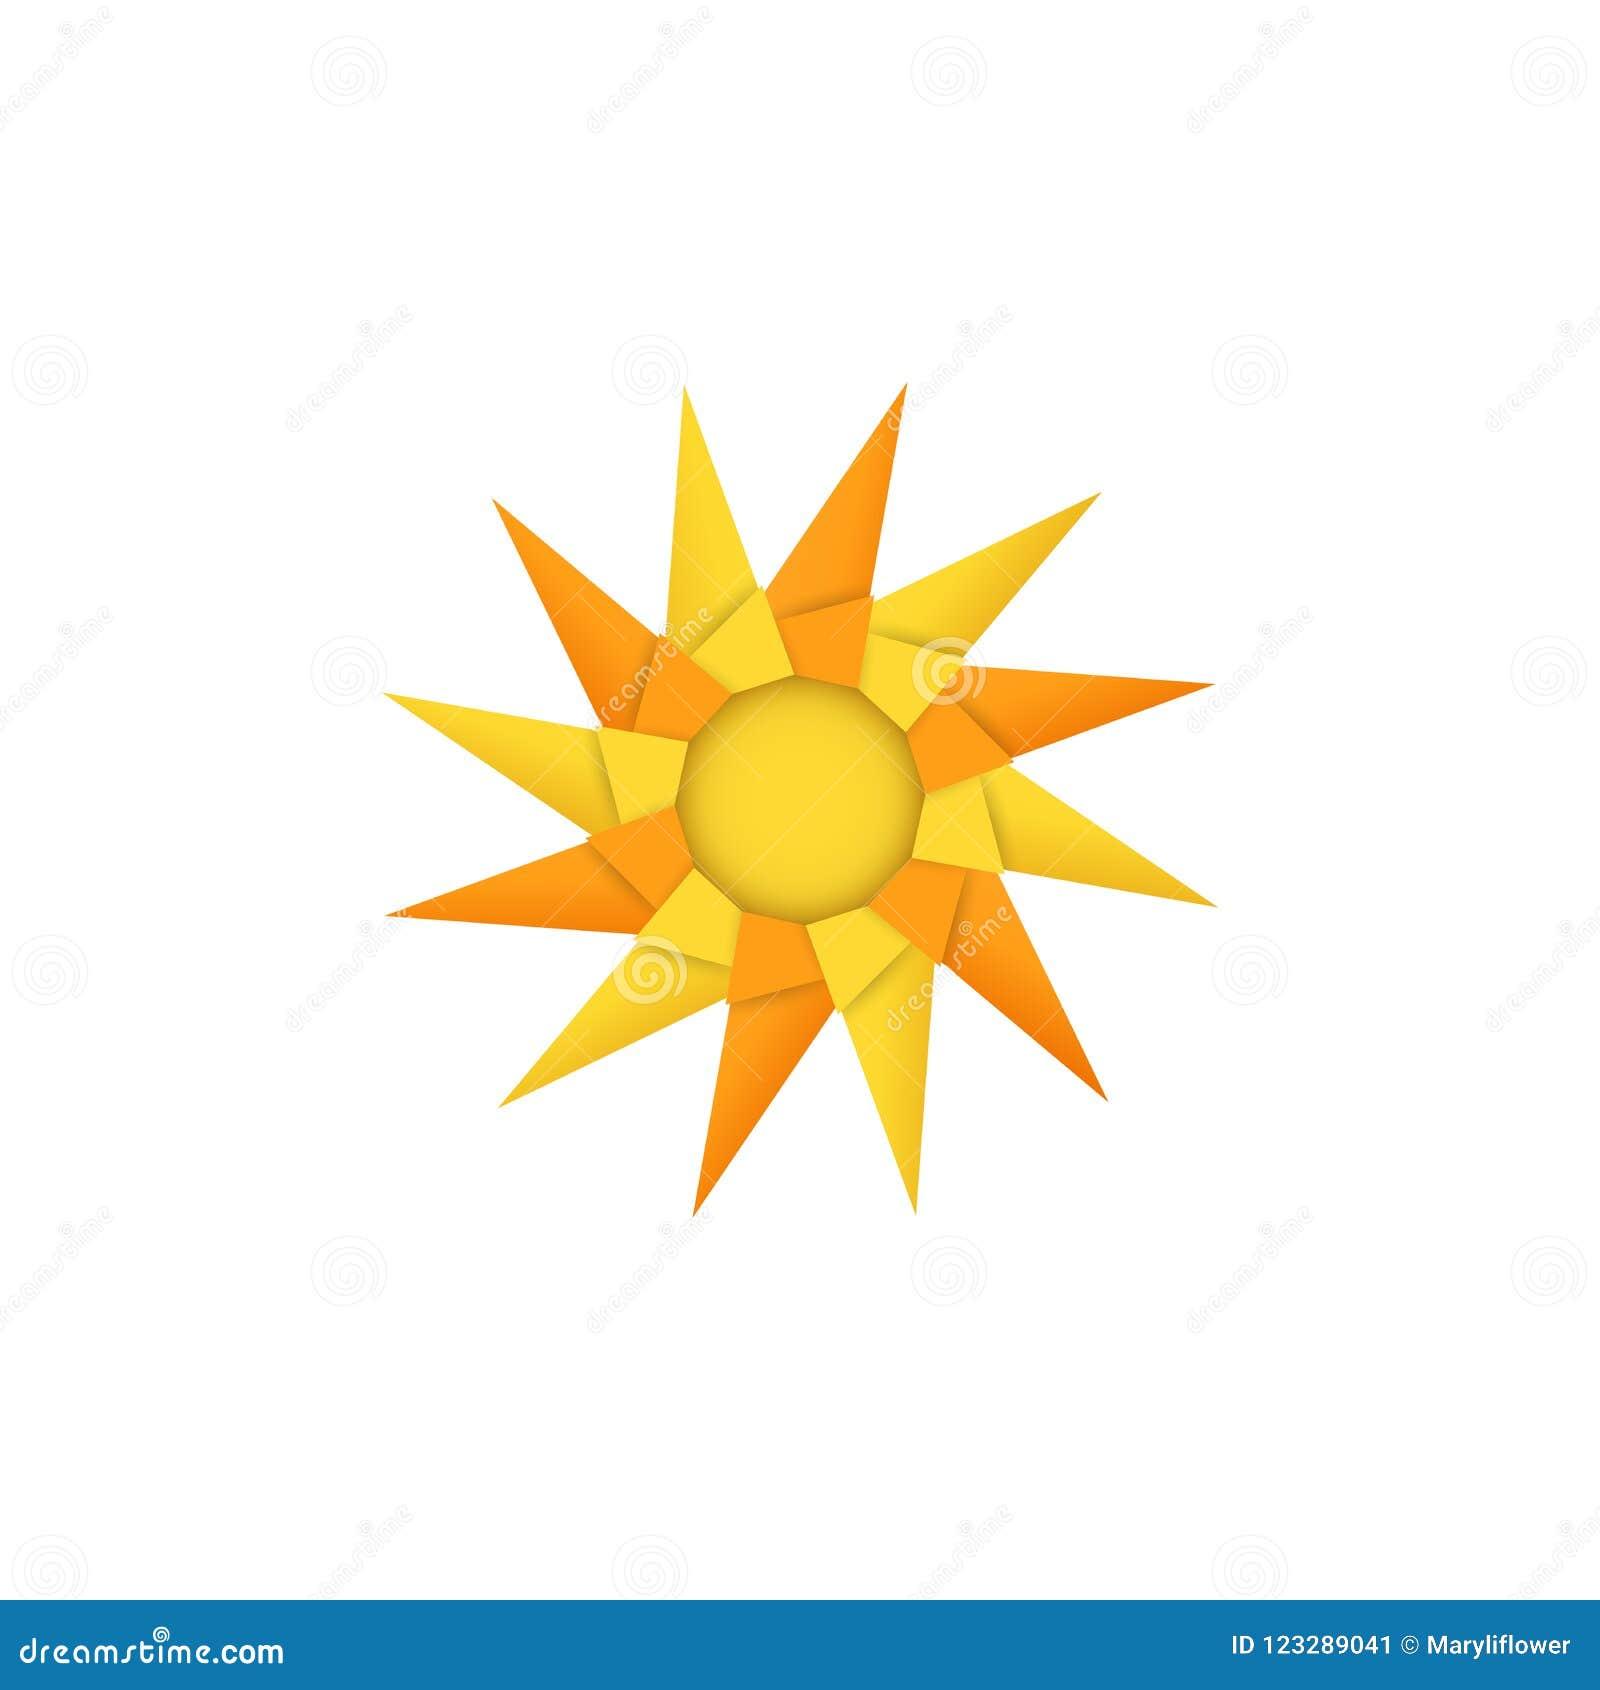 Isolated Modular Origami Pinwheel Toy or Sun on White Background ...